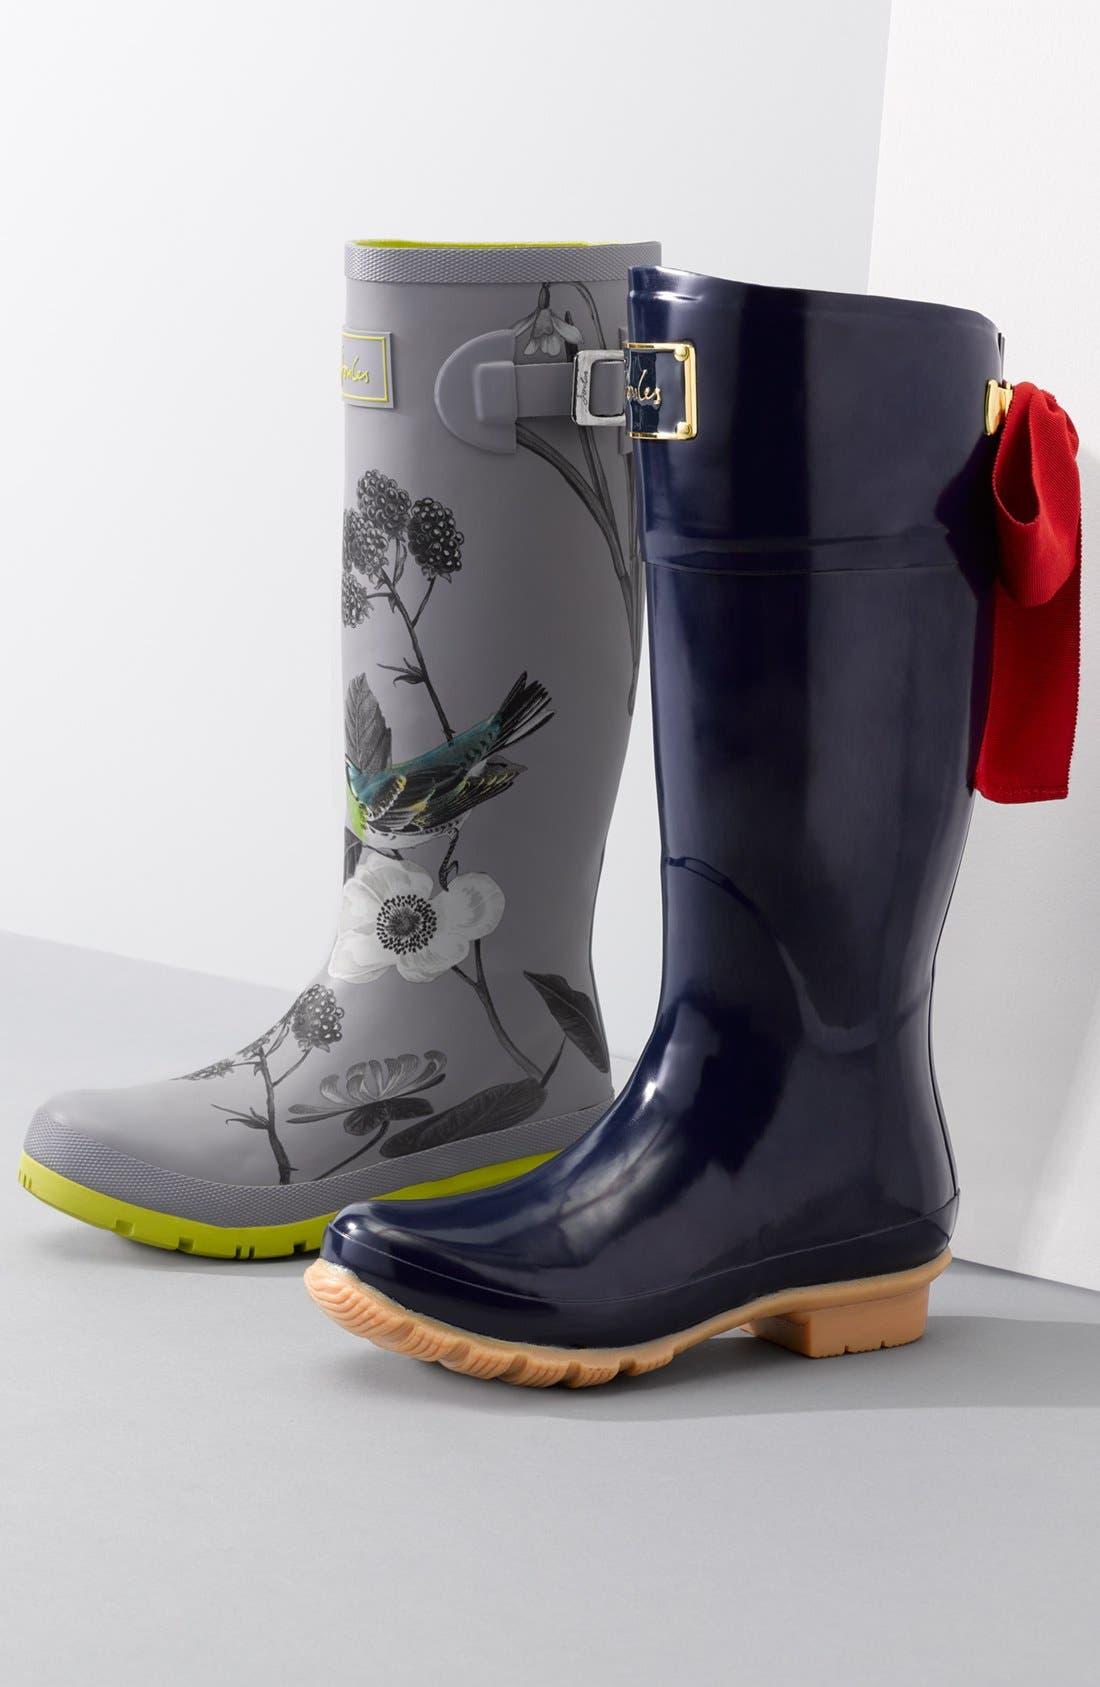 JOULES, 'Evedon' Rain Boot, Main thumbnail 1, color, 411